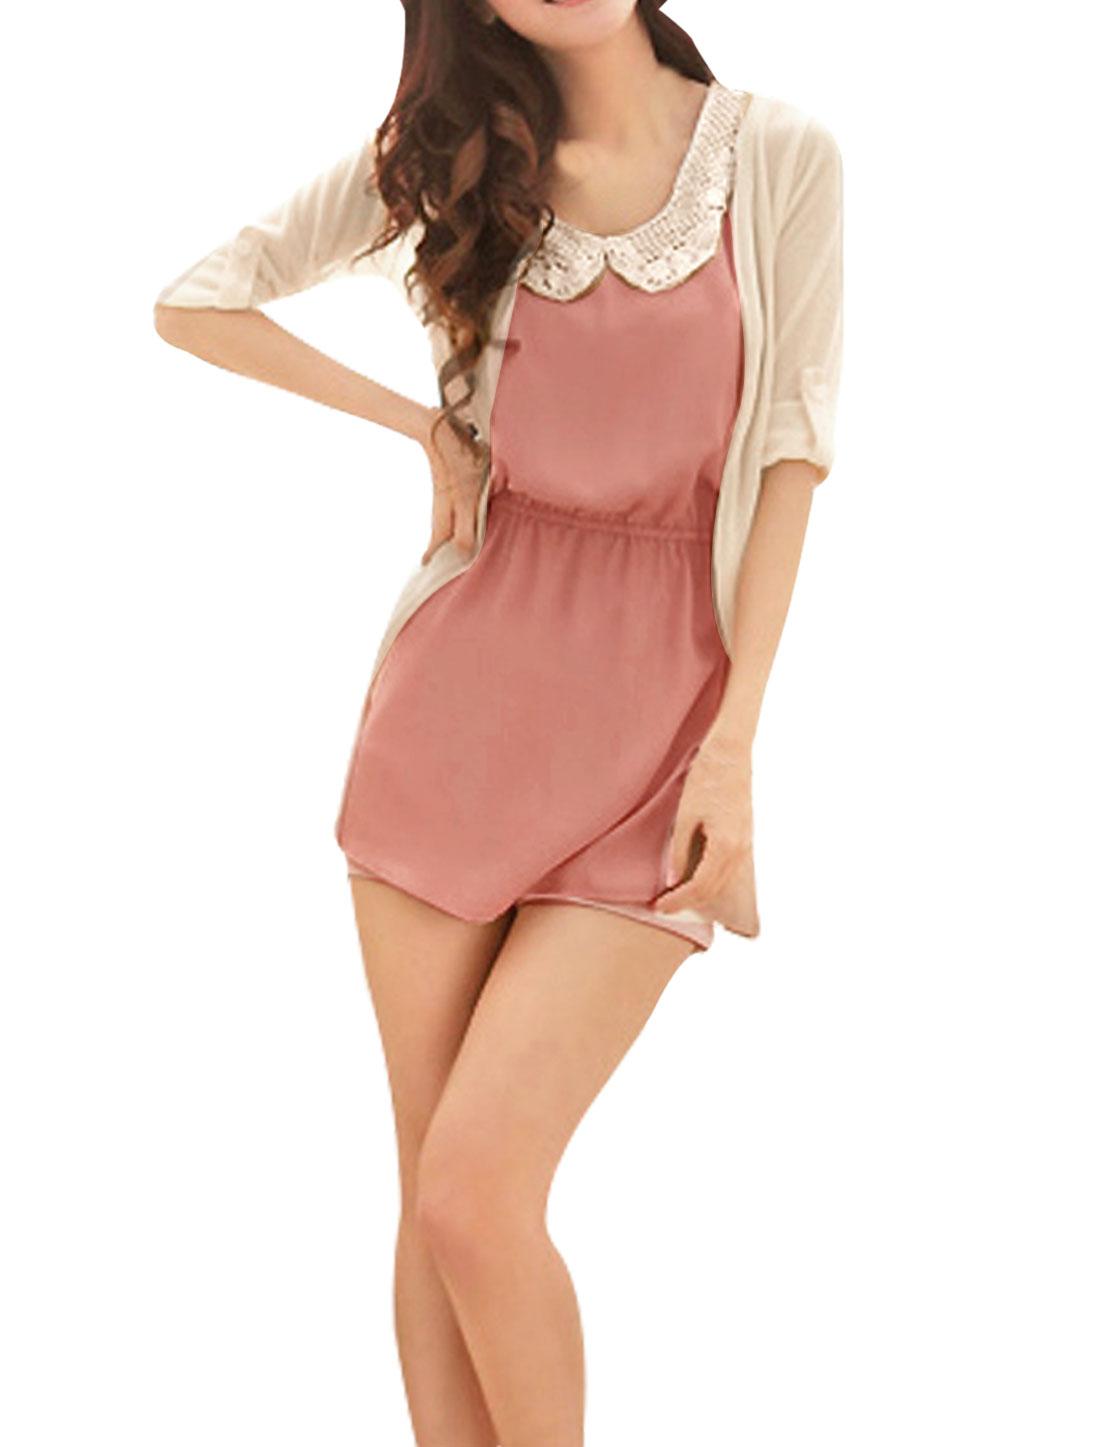 Women White Lace Detail Scoop Neck Sleeveless Pink Mini Dress w Beige Cardigan XS